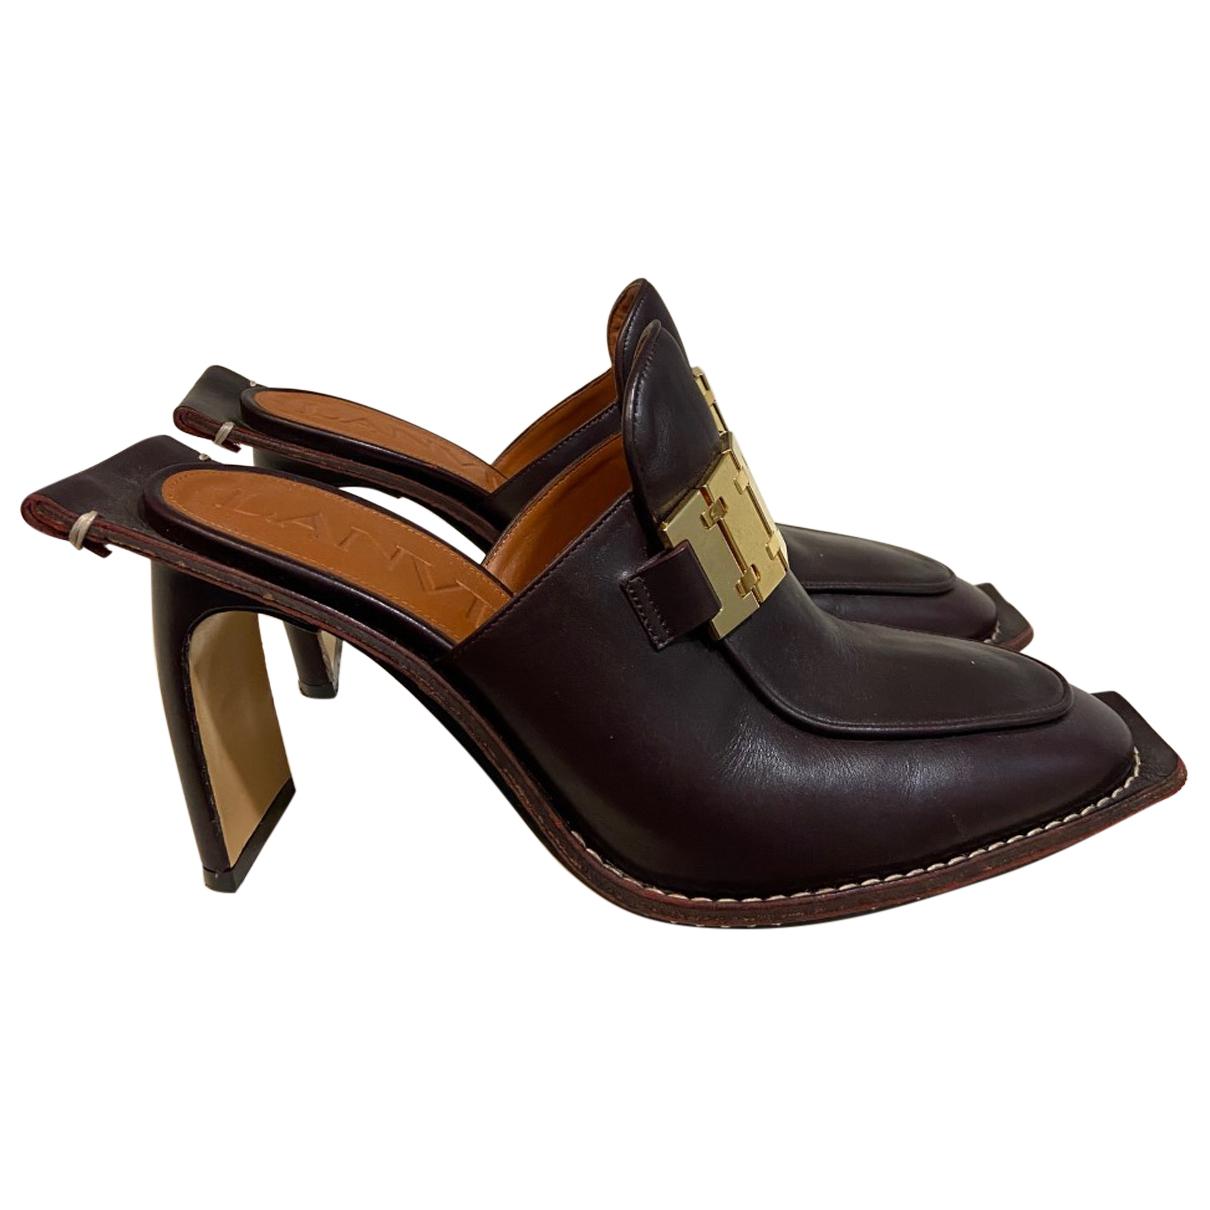 Lanvin N Burgundy Leather Sandals for Women 38 EU